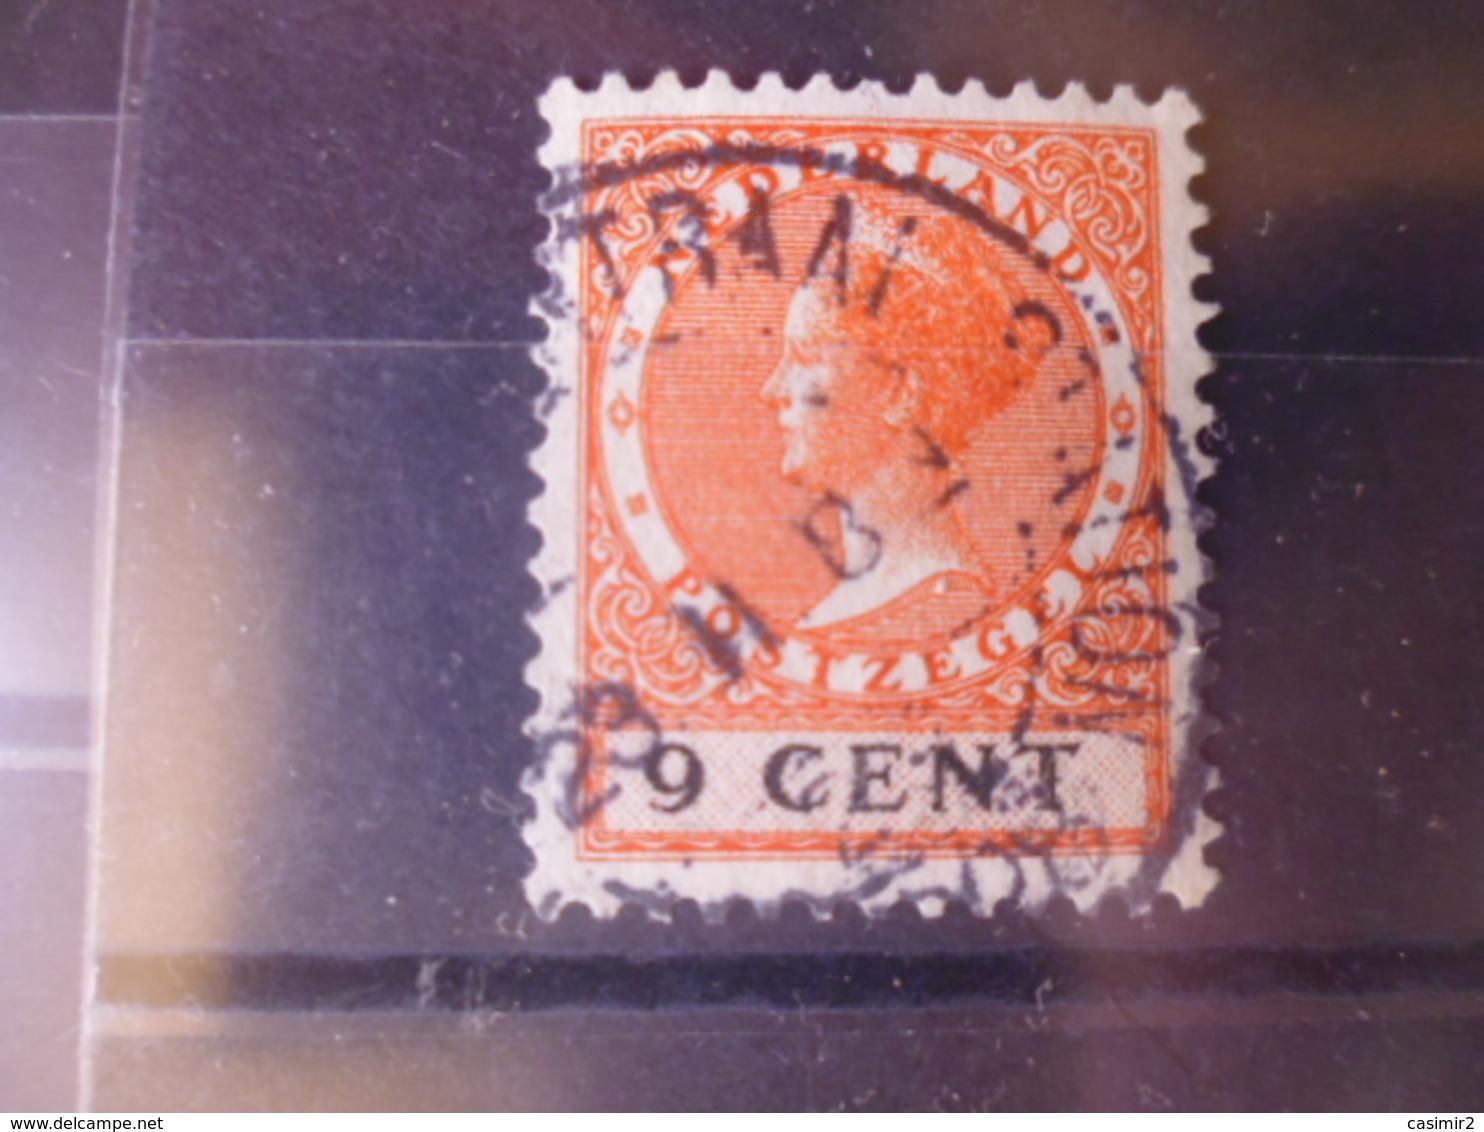 PAYS BAS TIMBRE OU SÉRIE COMPLETE YVERT N° 141 - 1891-1948 (Wilhelmine)